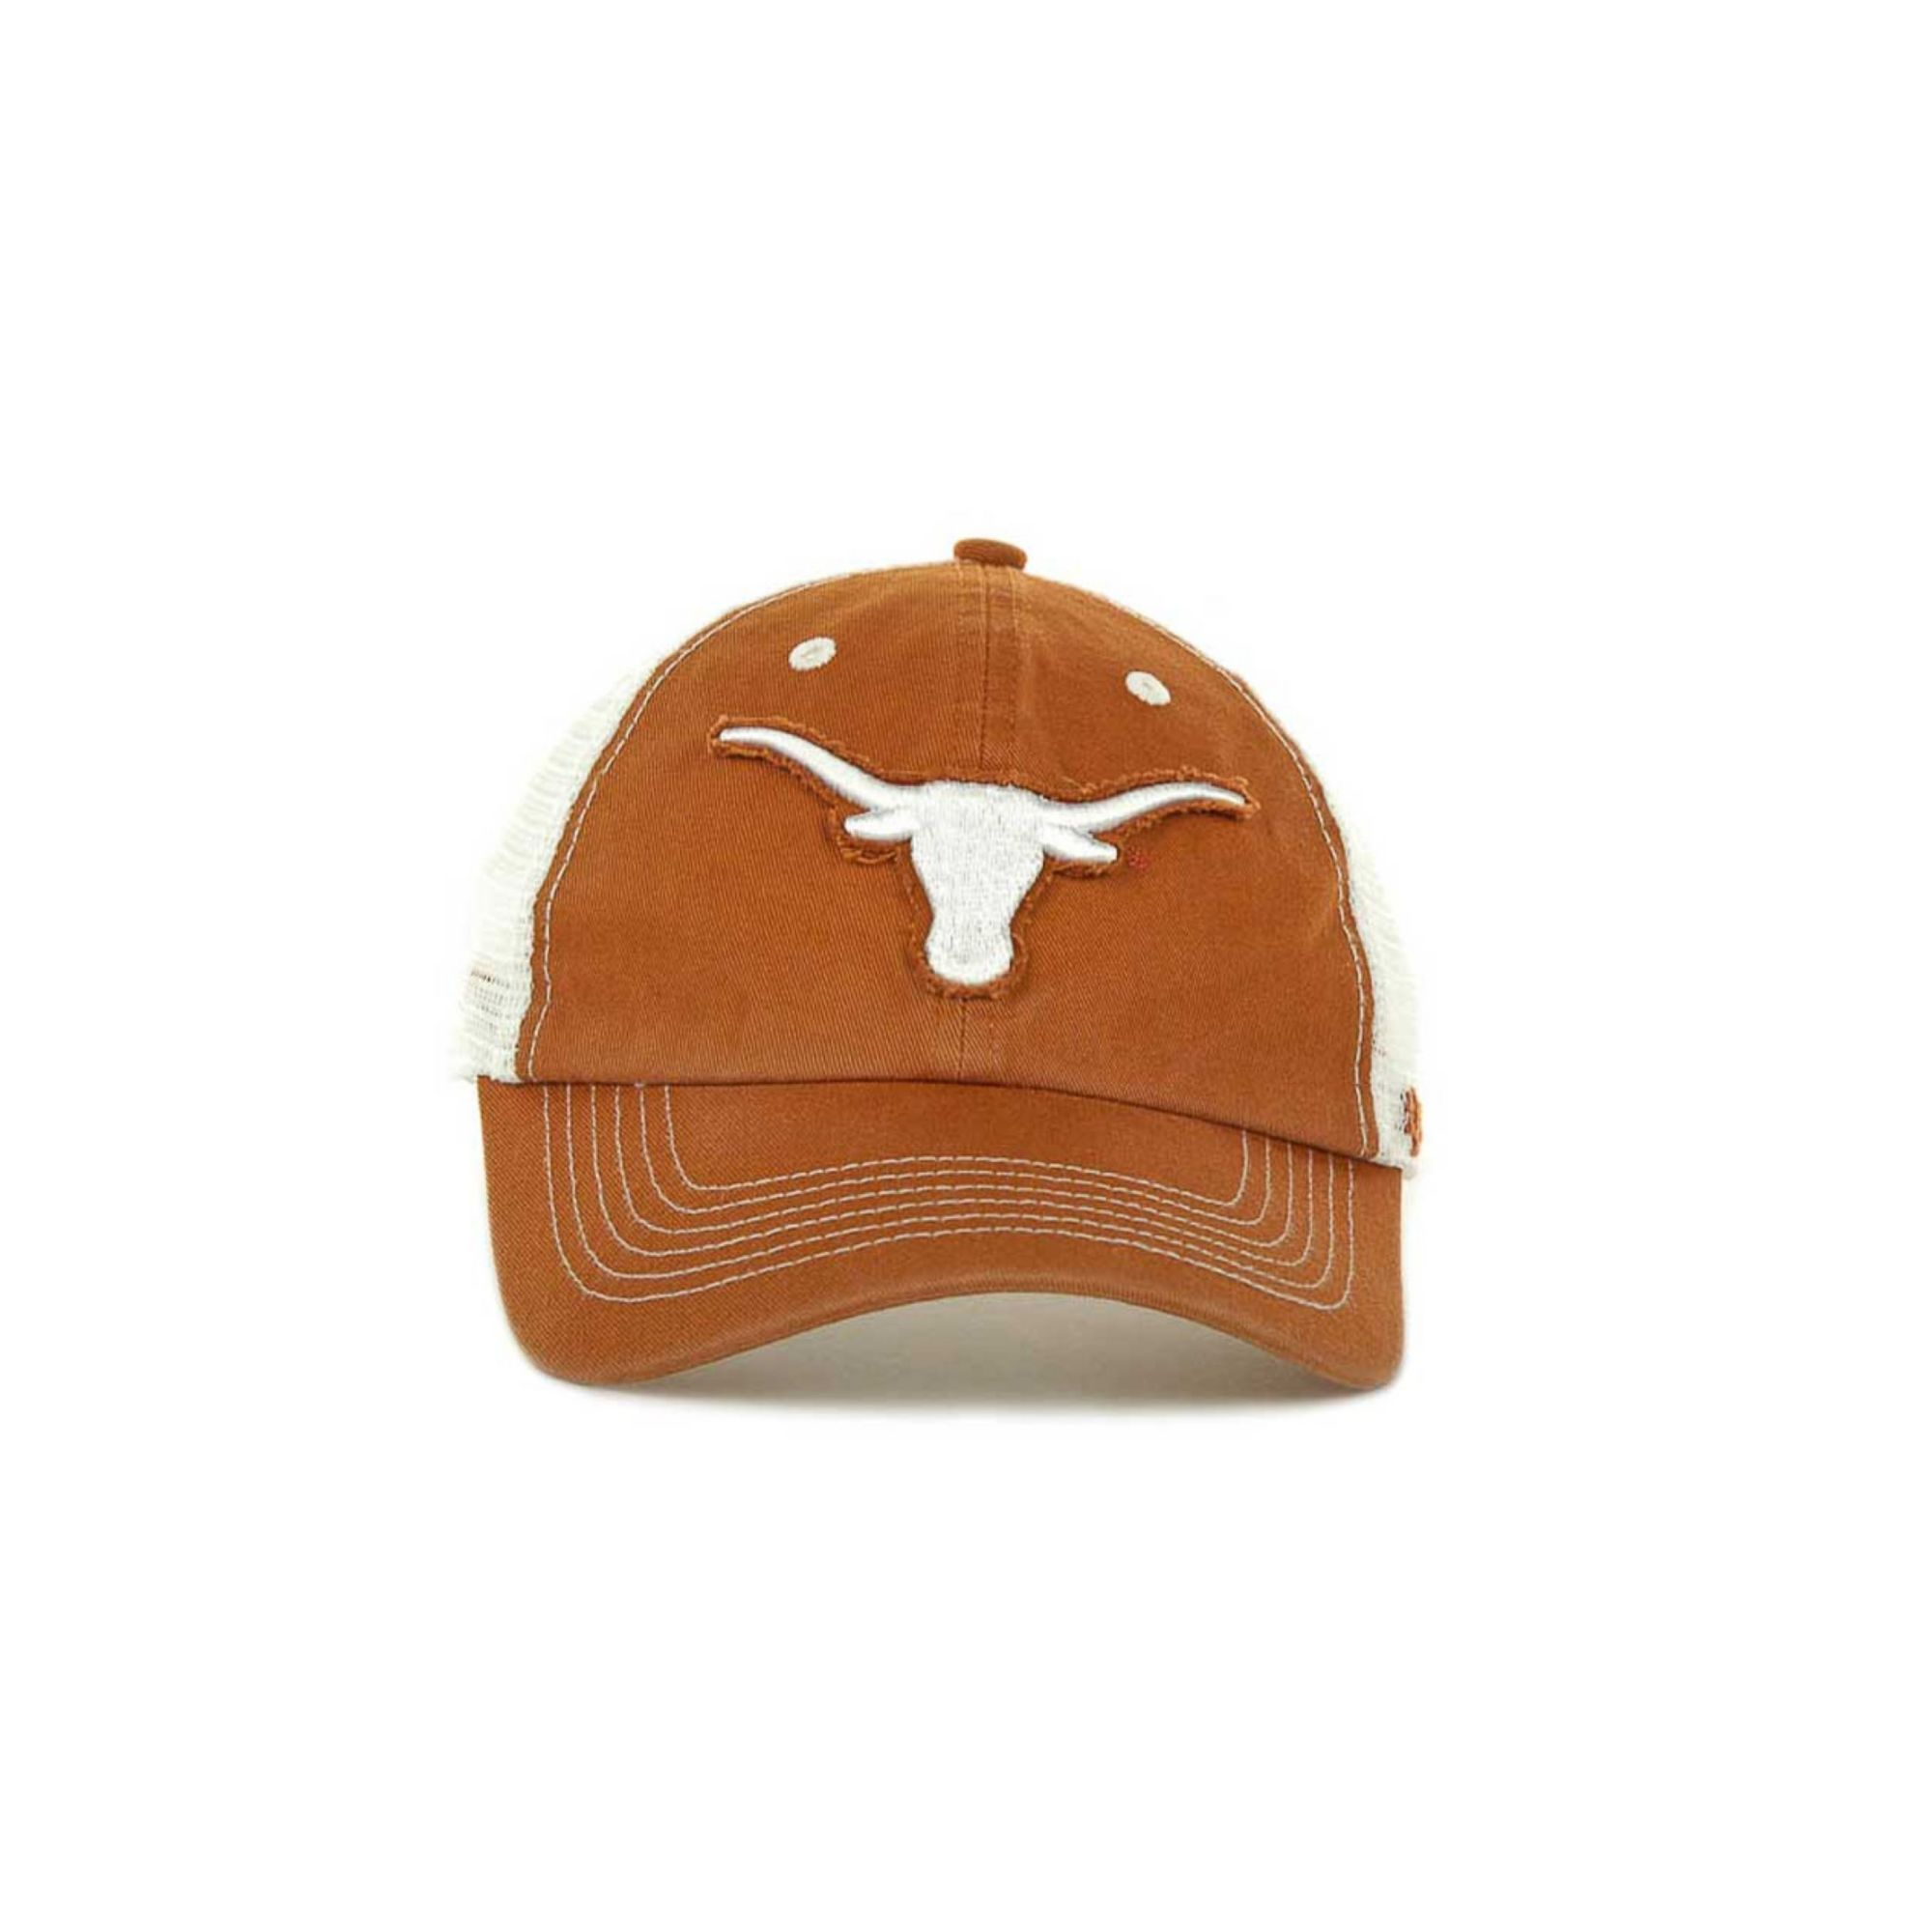 362d86ed5 where to buy texas longhorns trucker hat 75a92 fd23d